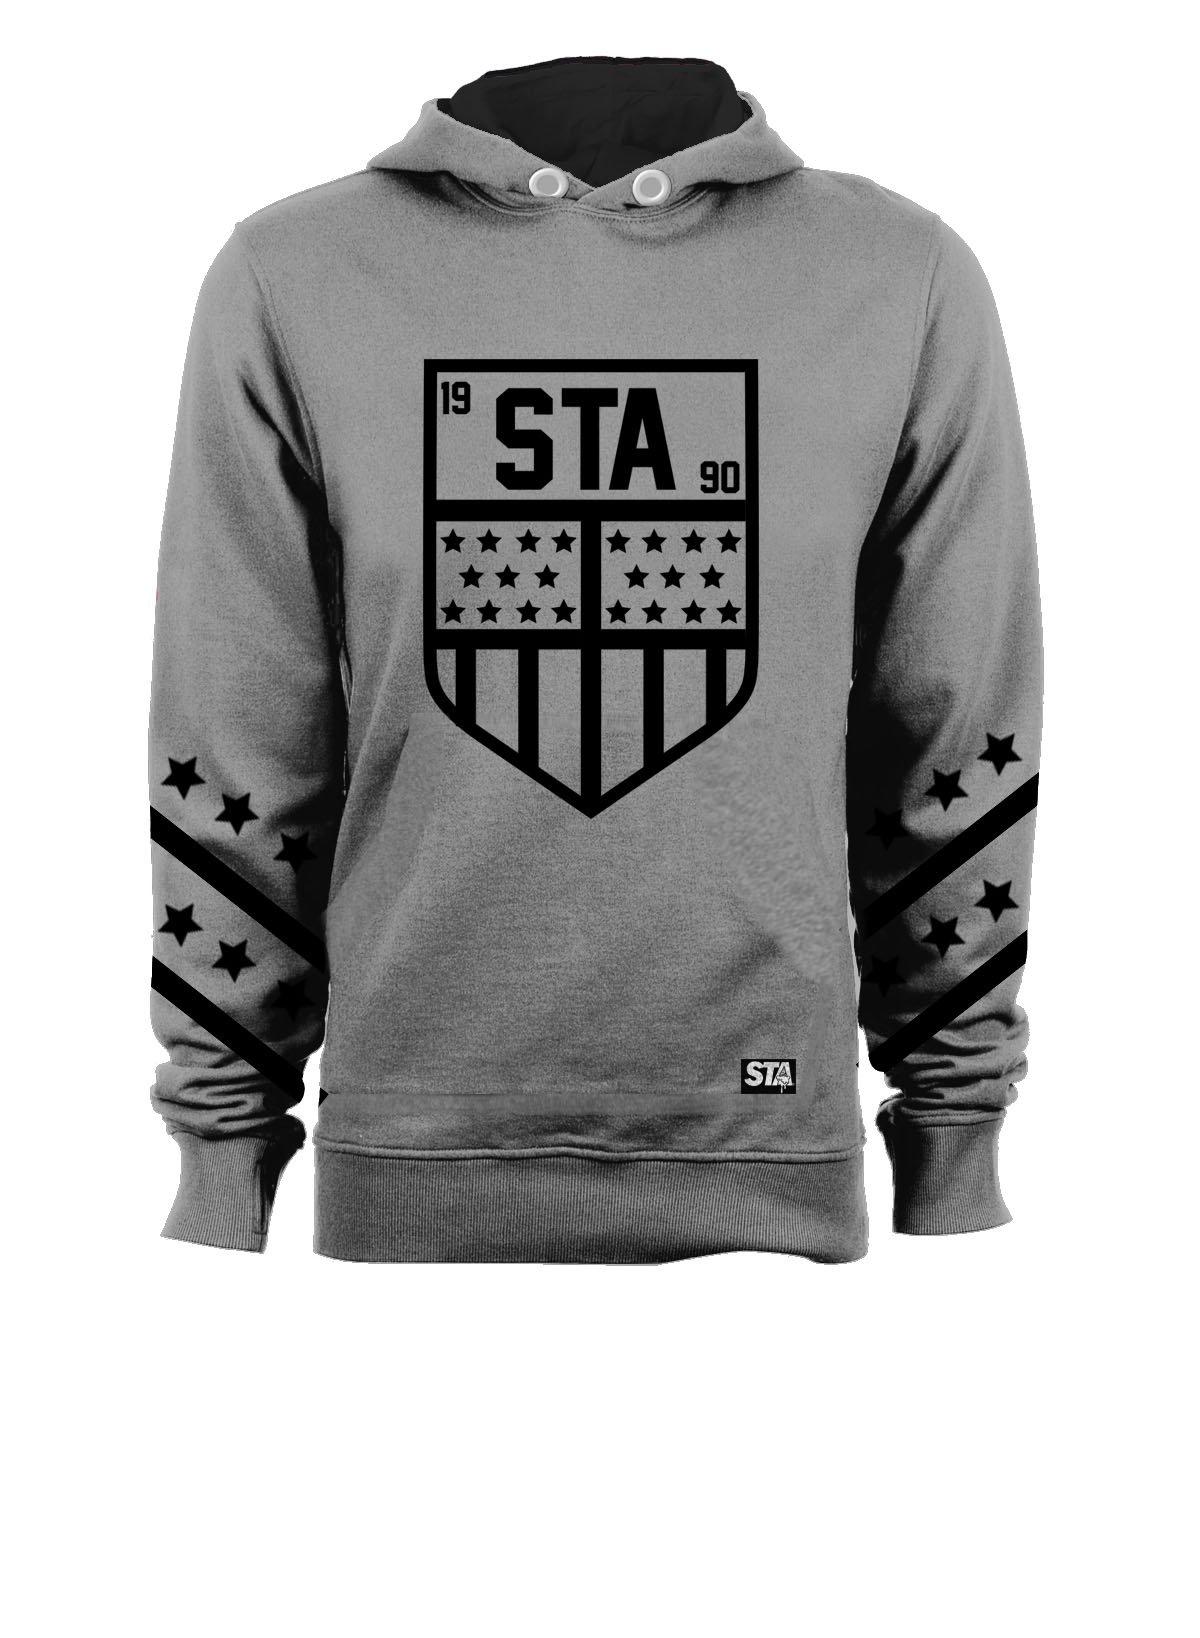 Image of Sta Badge T shirt Hoody Grey